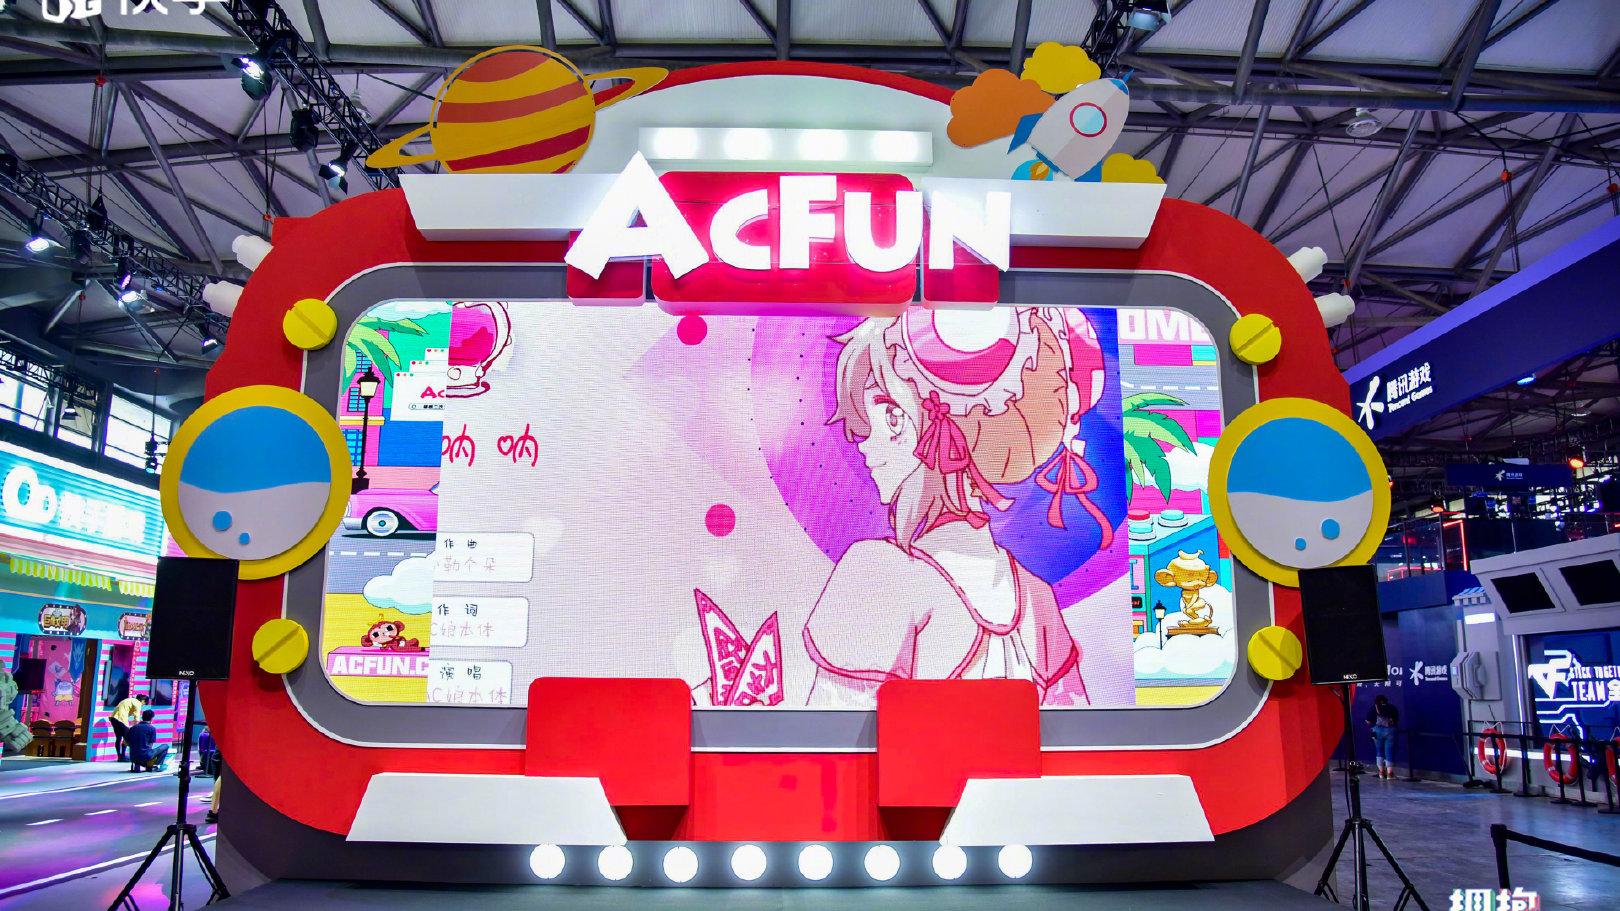 【CJ ACFUN现场】2020A站舞台最终场 紫颜 苏子怡 摸凹猫 雾奈奈舞蹈部分录屏